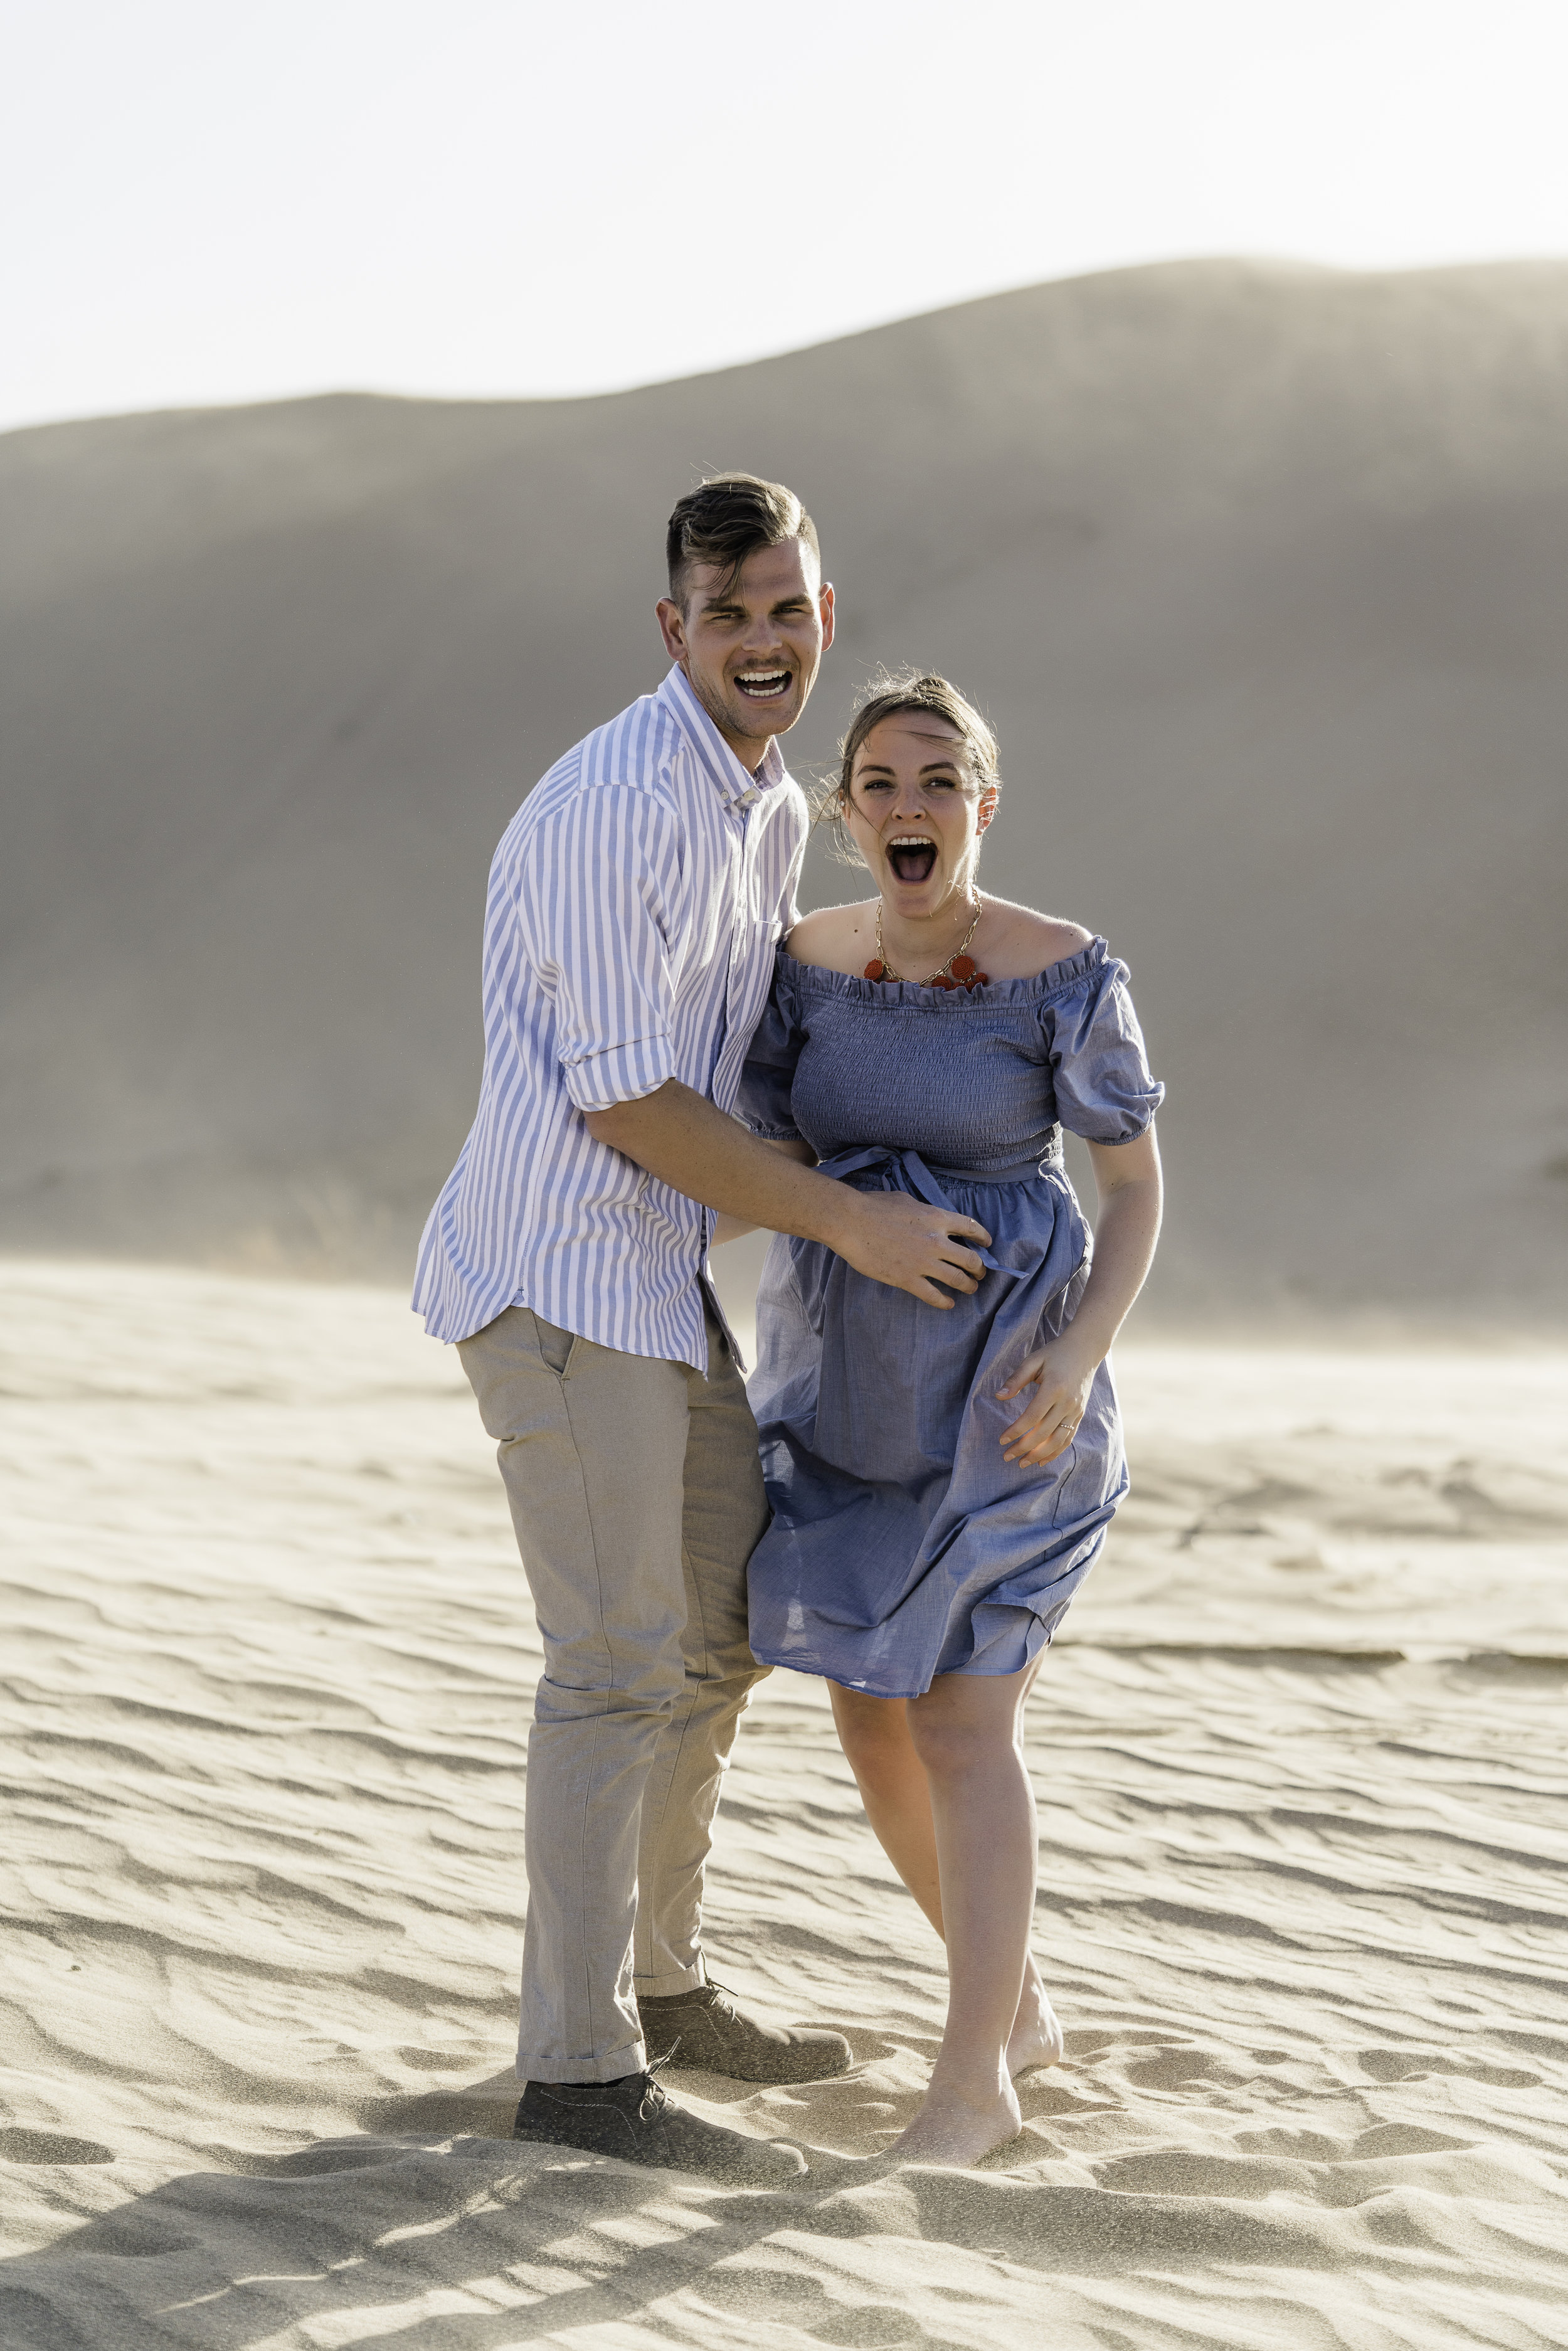 NewMexico-Sand-Dunes-Proposal-Carissa-and-Ben-1061.jpg